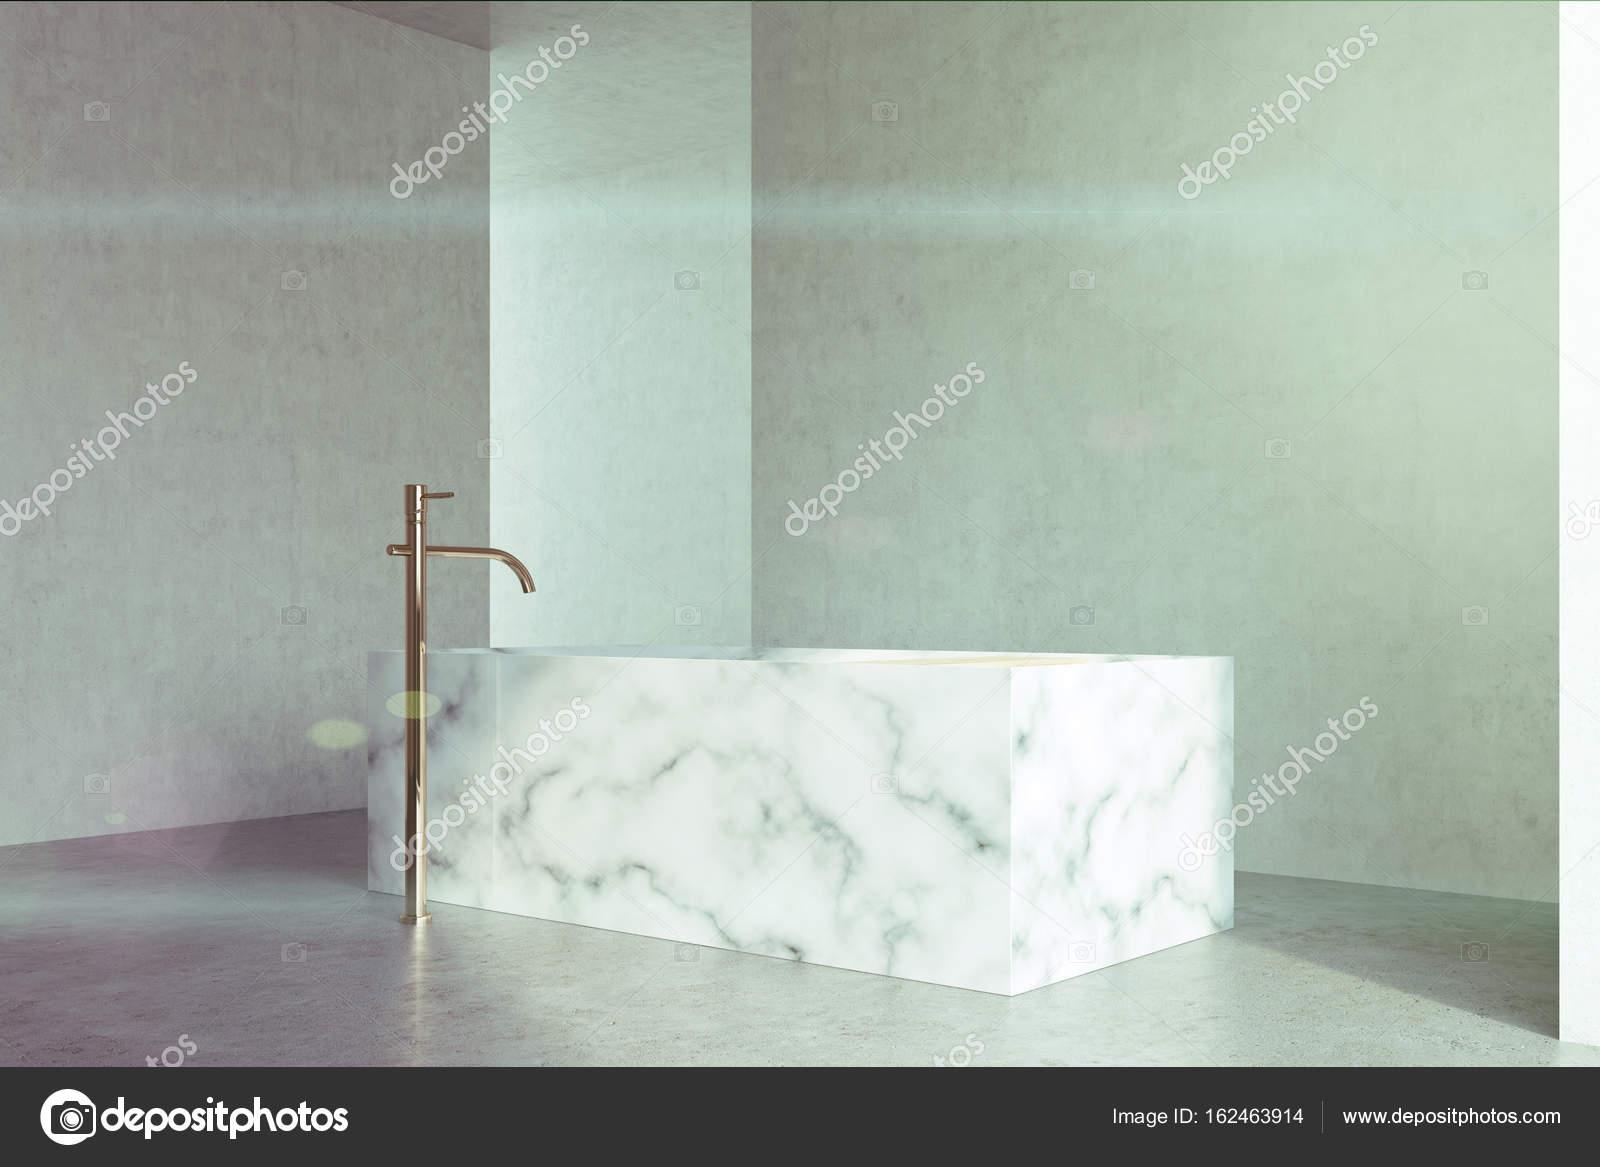 Concrete badkamer, marmeren bad beton toned — Stockfoto ...